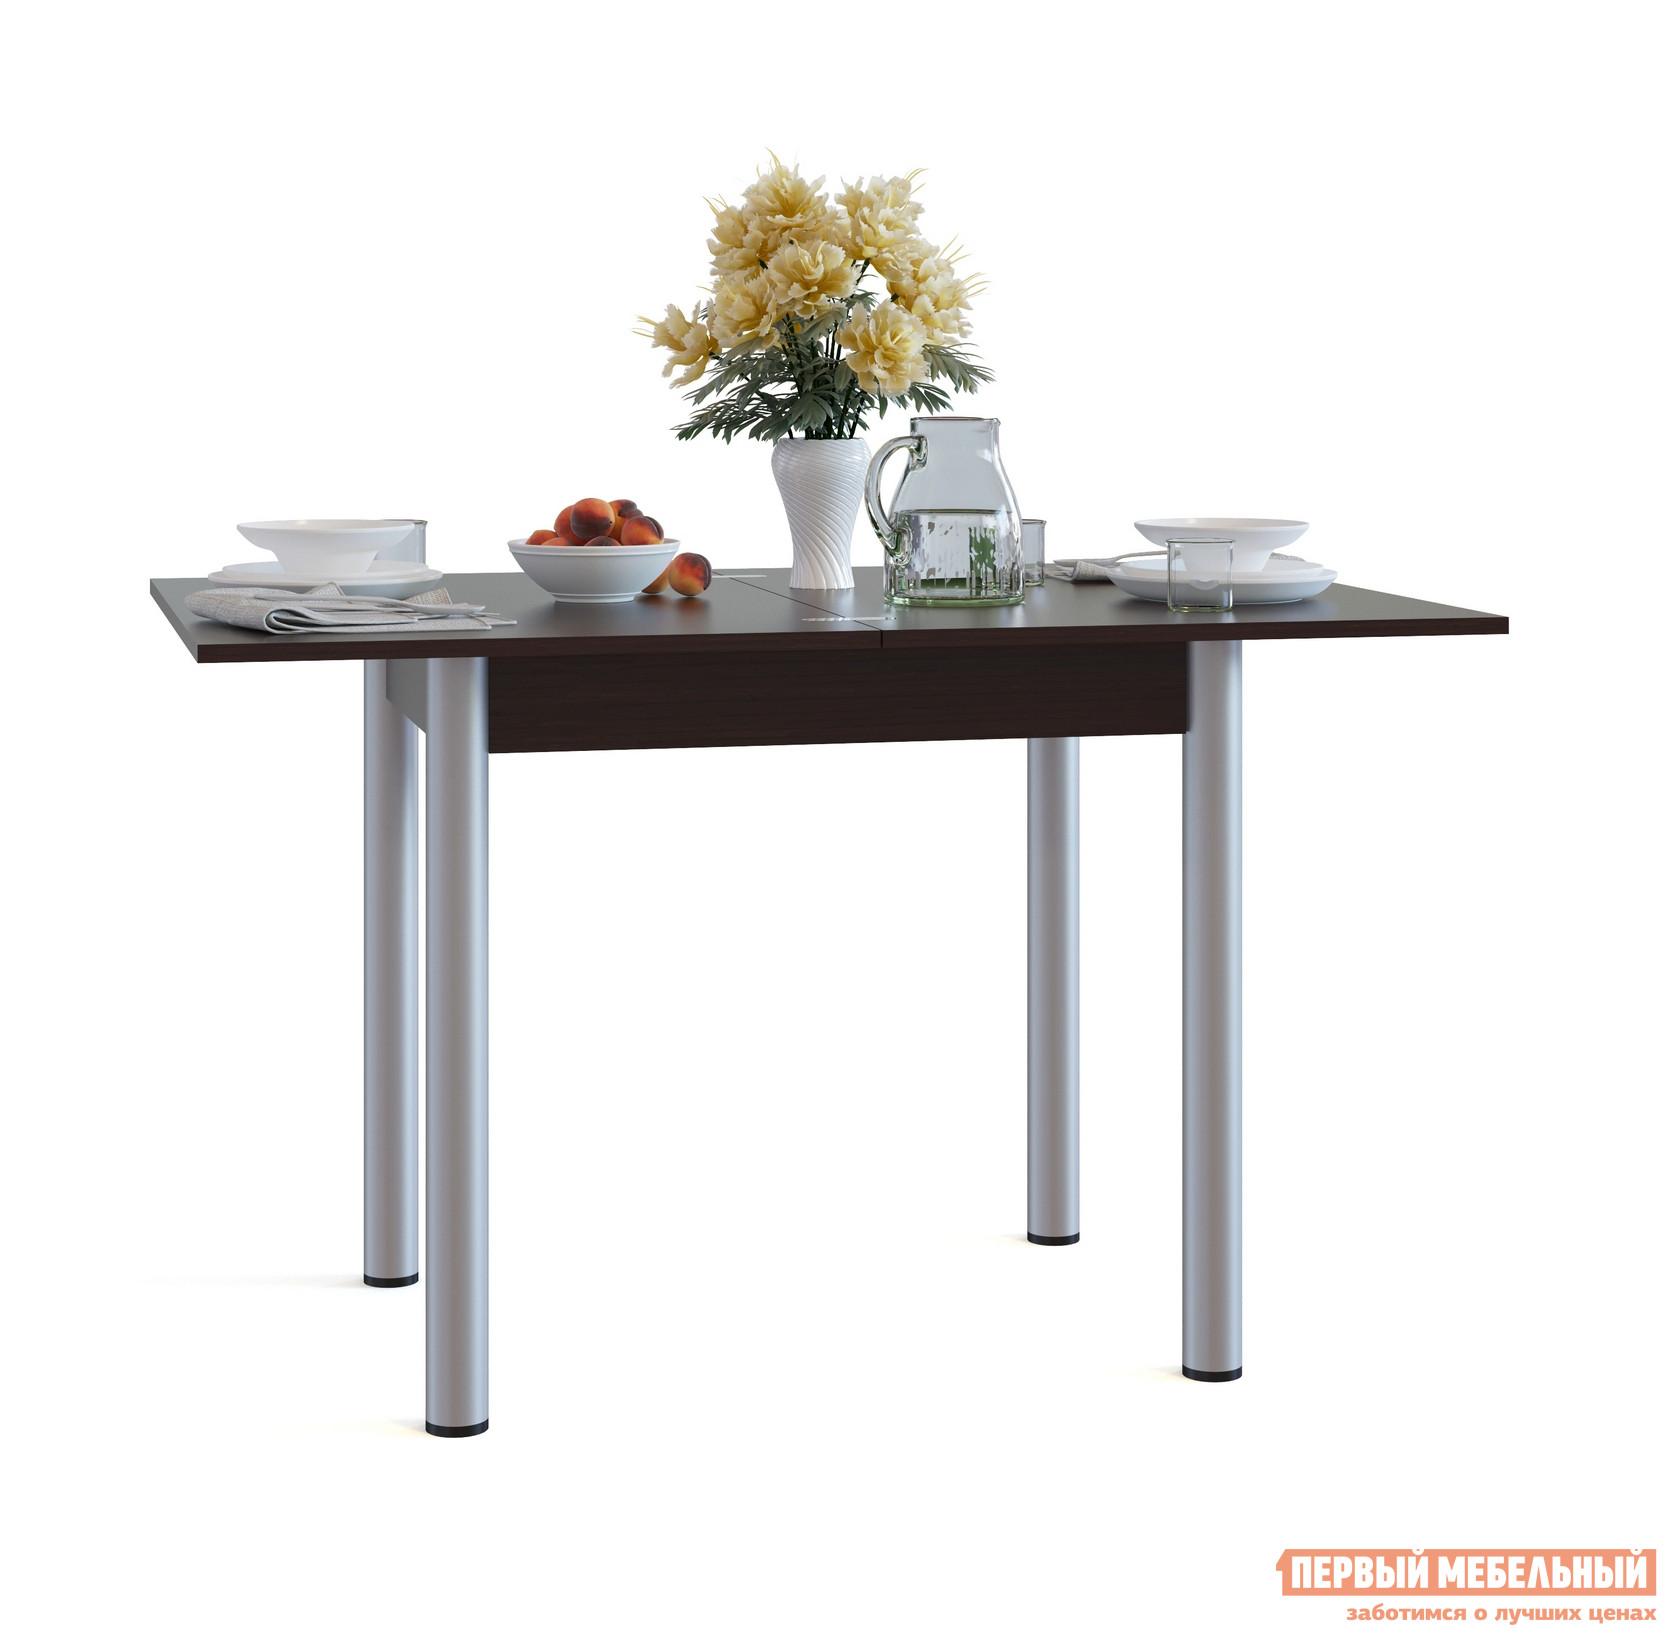 Кухонный стол Сокол СО-1м Венге